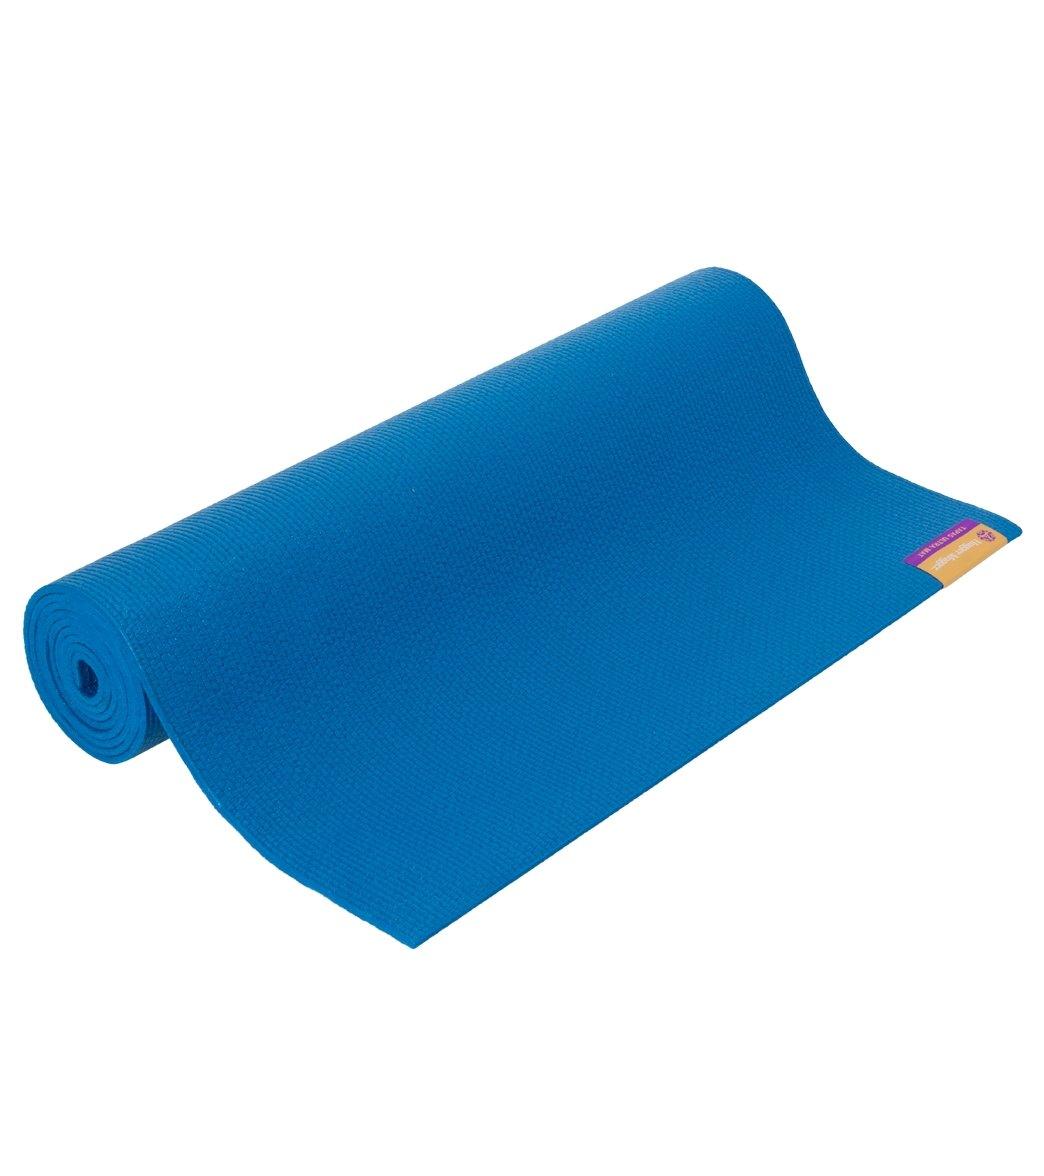 Hugger Mugger Tapas Ultra Thick Extra Long Yoga Mat 80